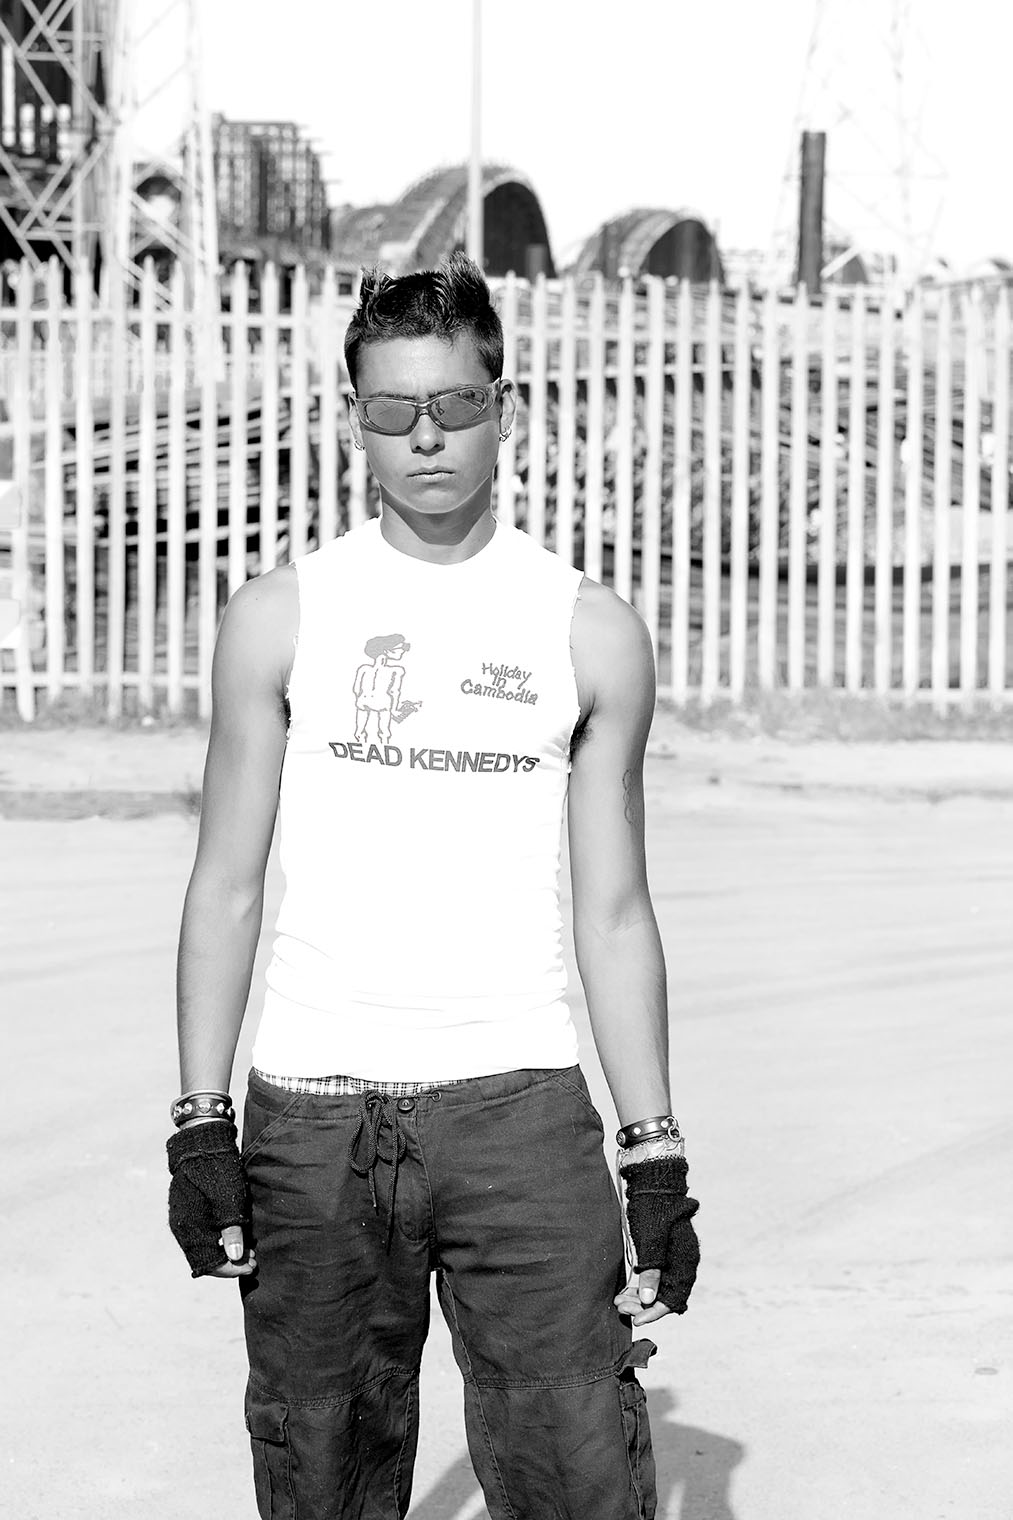 tough guy at fashion photoshoot at Los Angeles bridge construction site